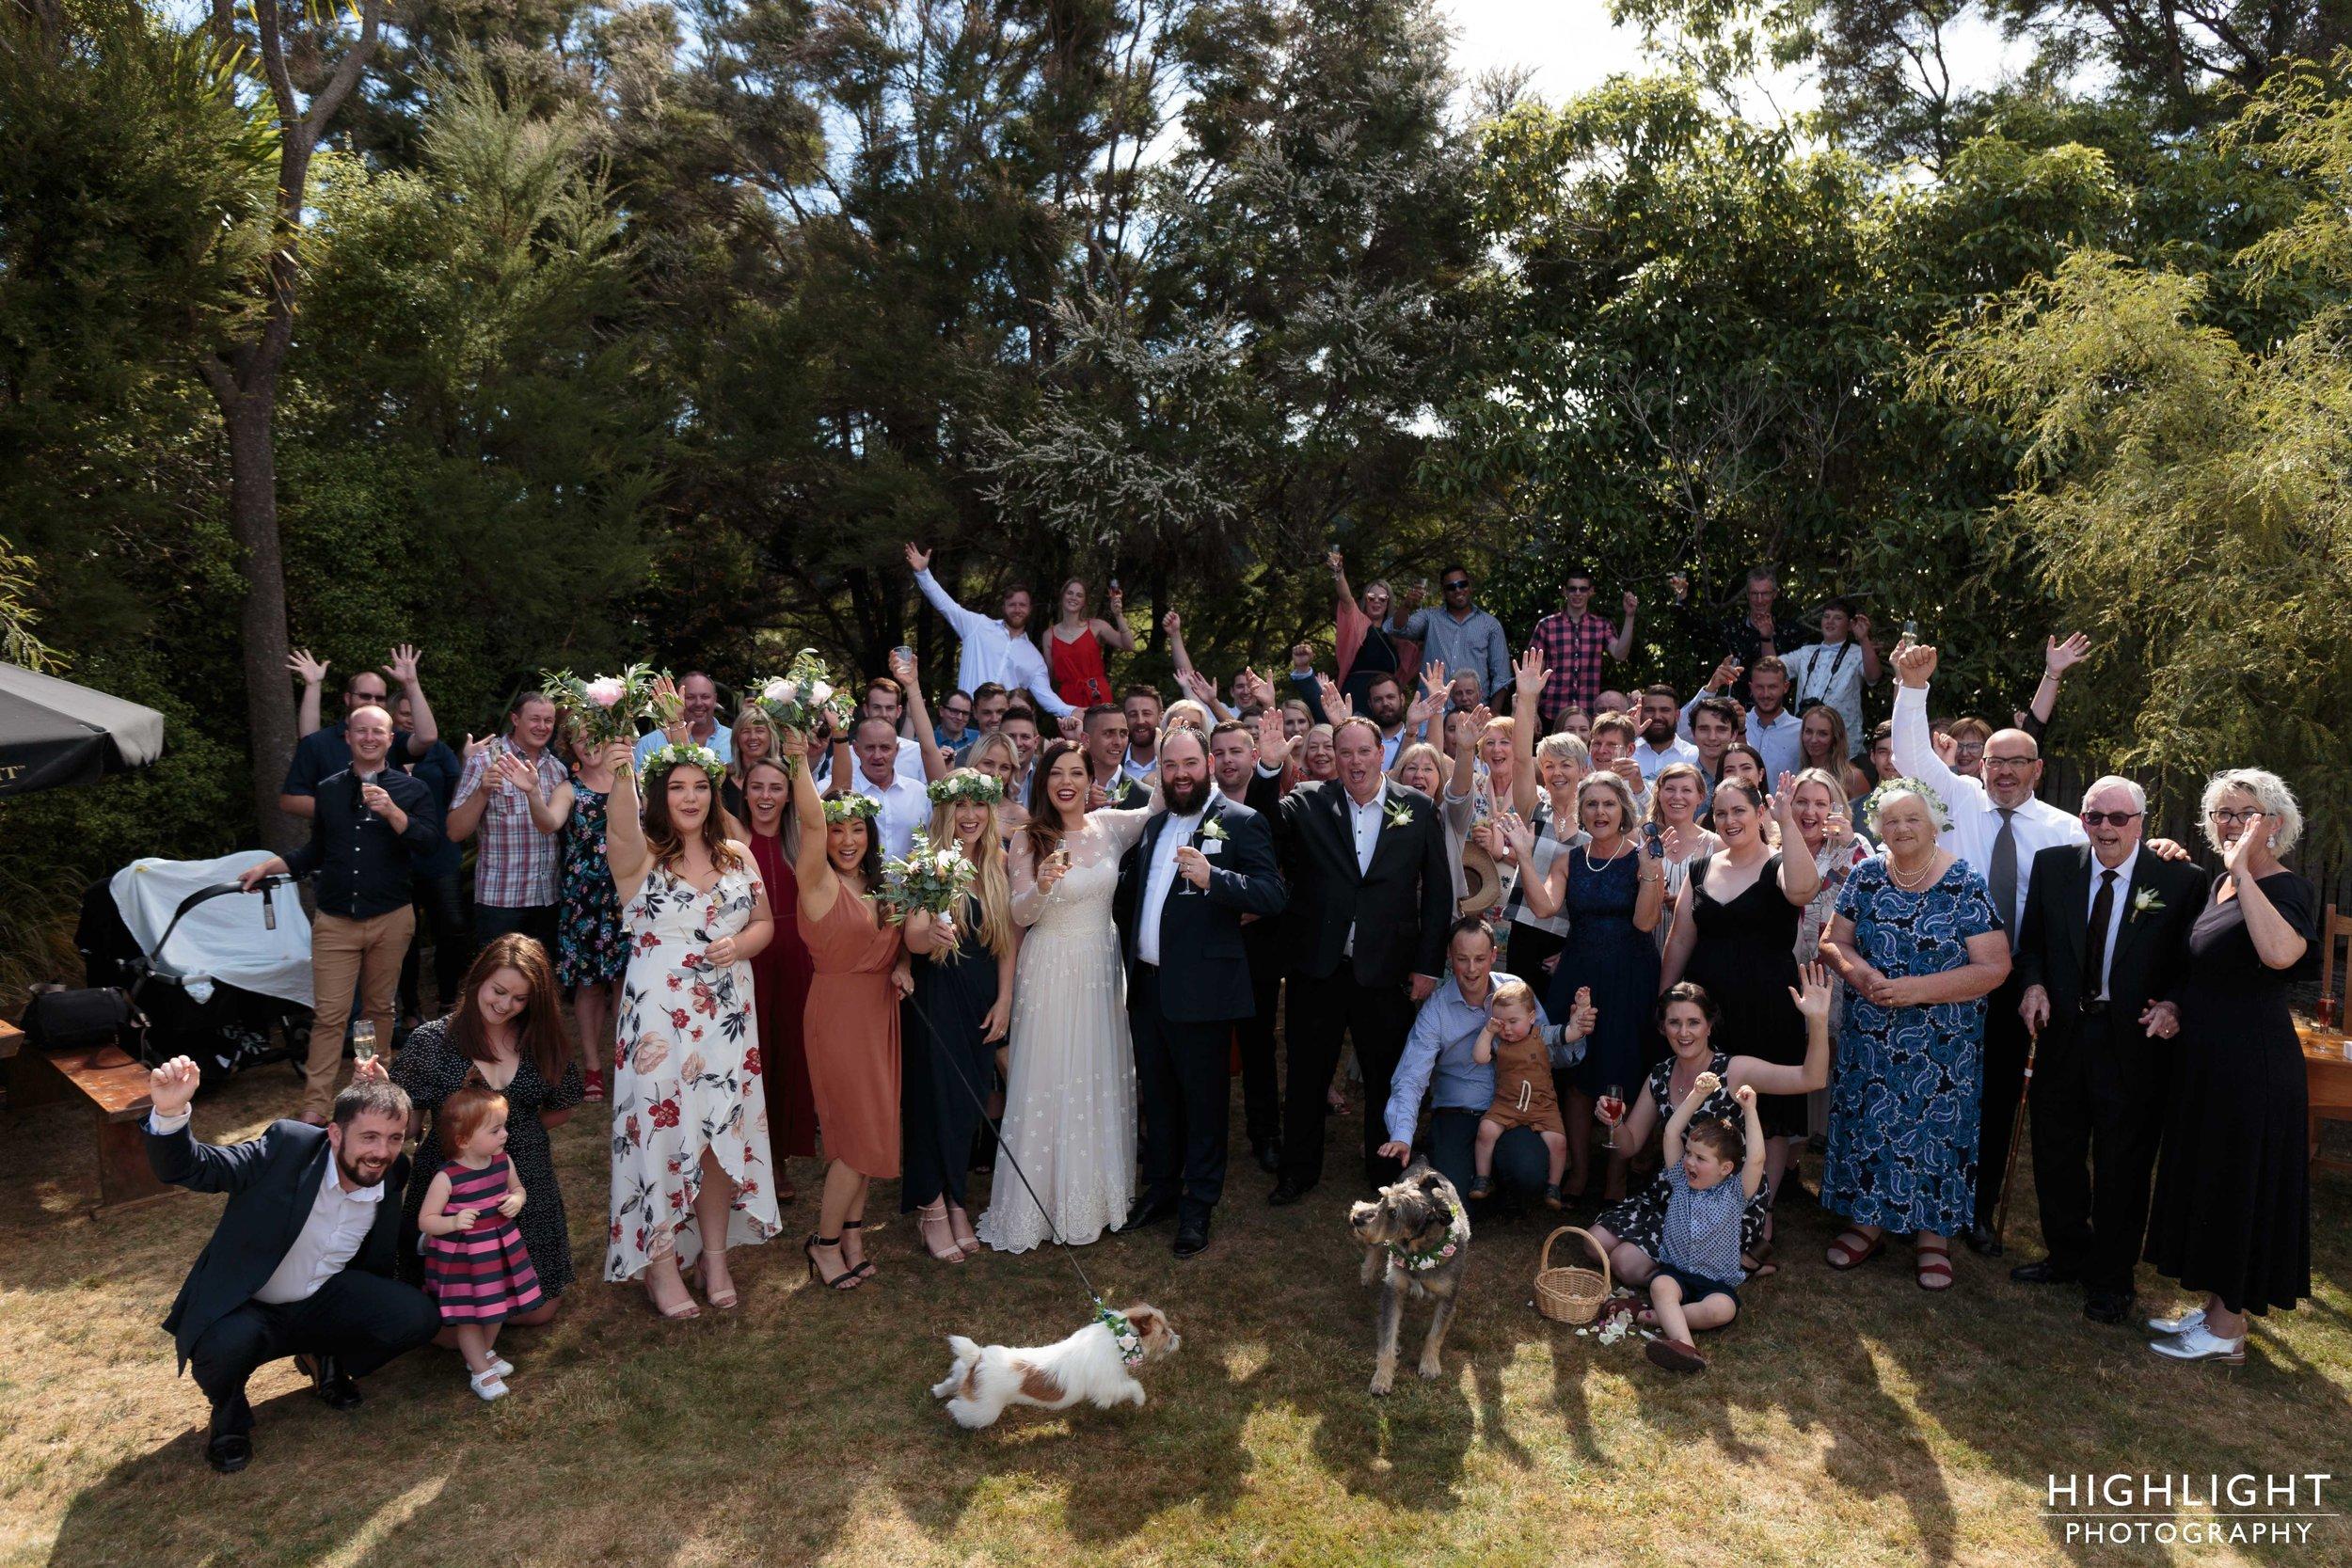 highlight-wedding-photography-new-zealand-makoura-lodge-wedding-98.jpg